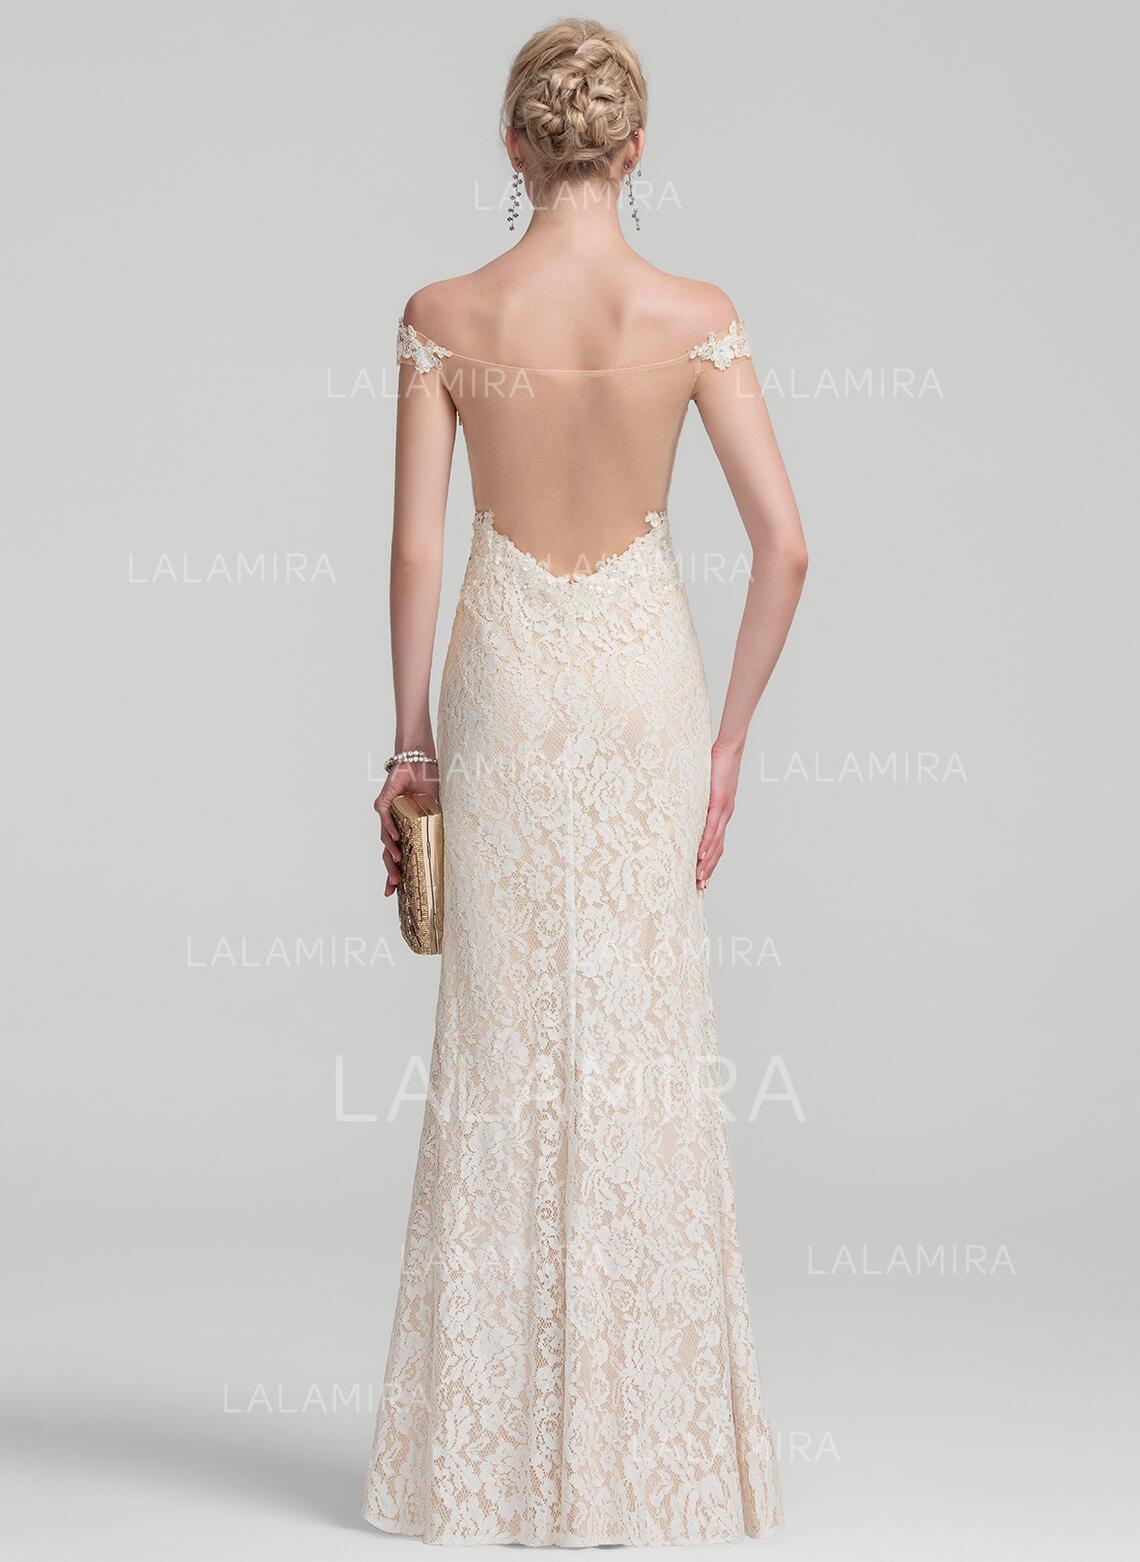 Off-the-Shoulder Floor-Length Lace Evening Dress